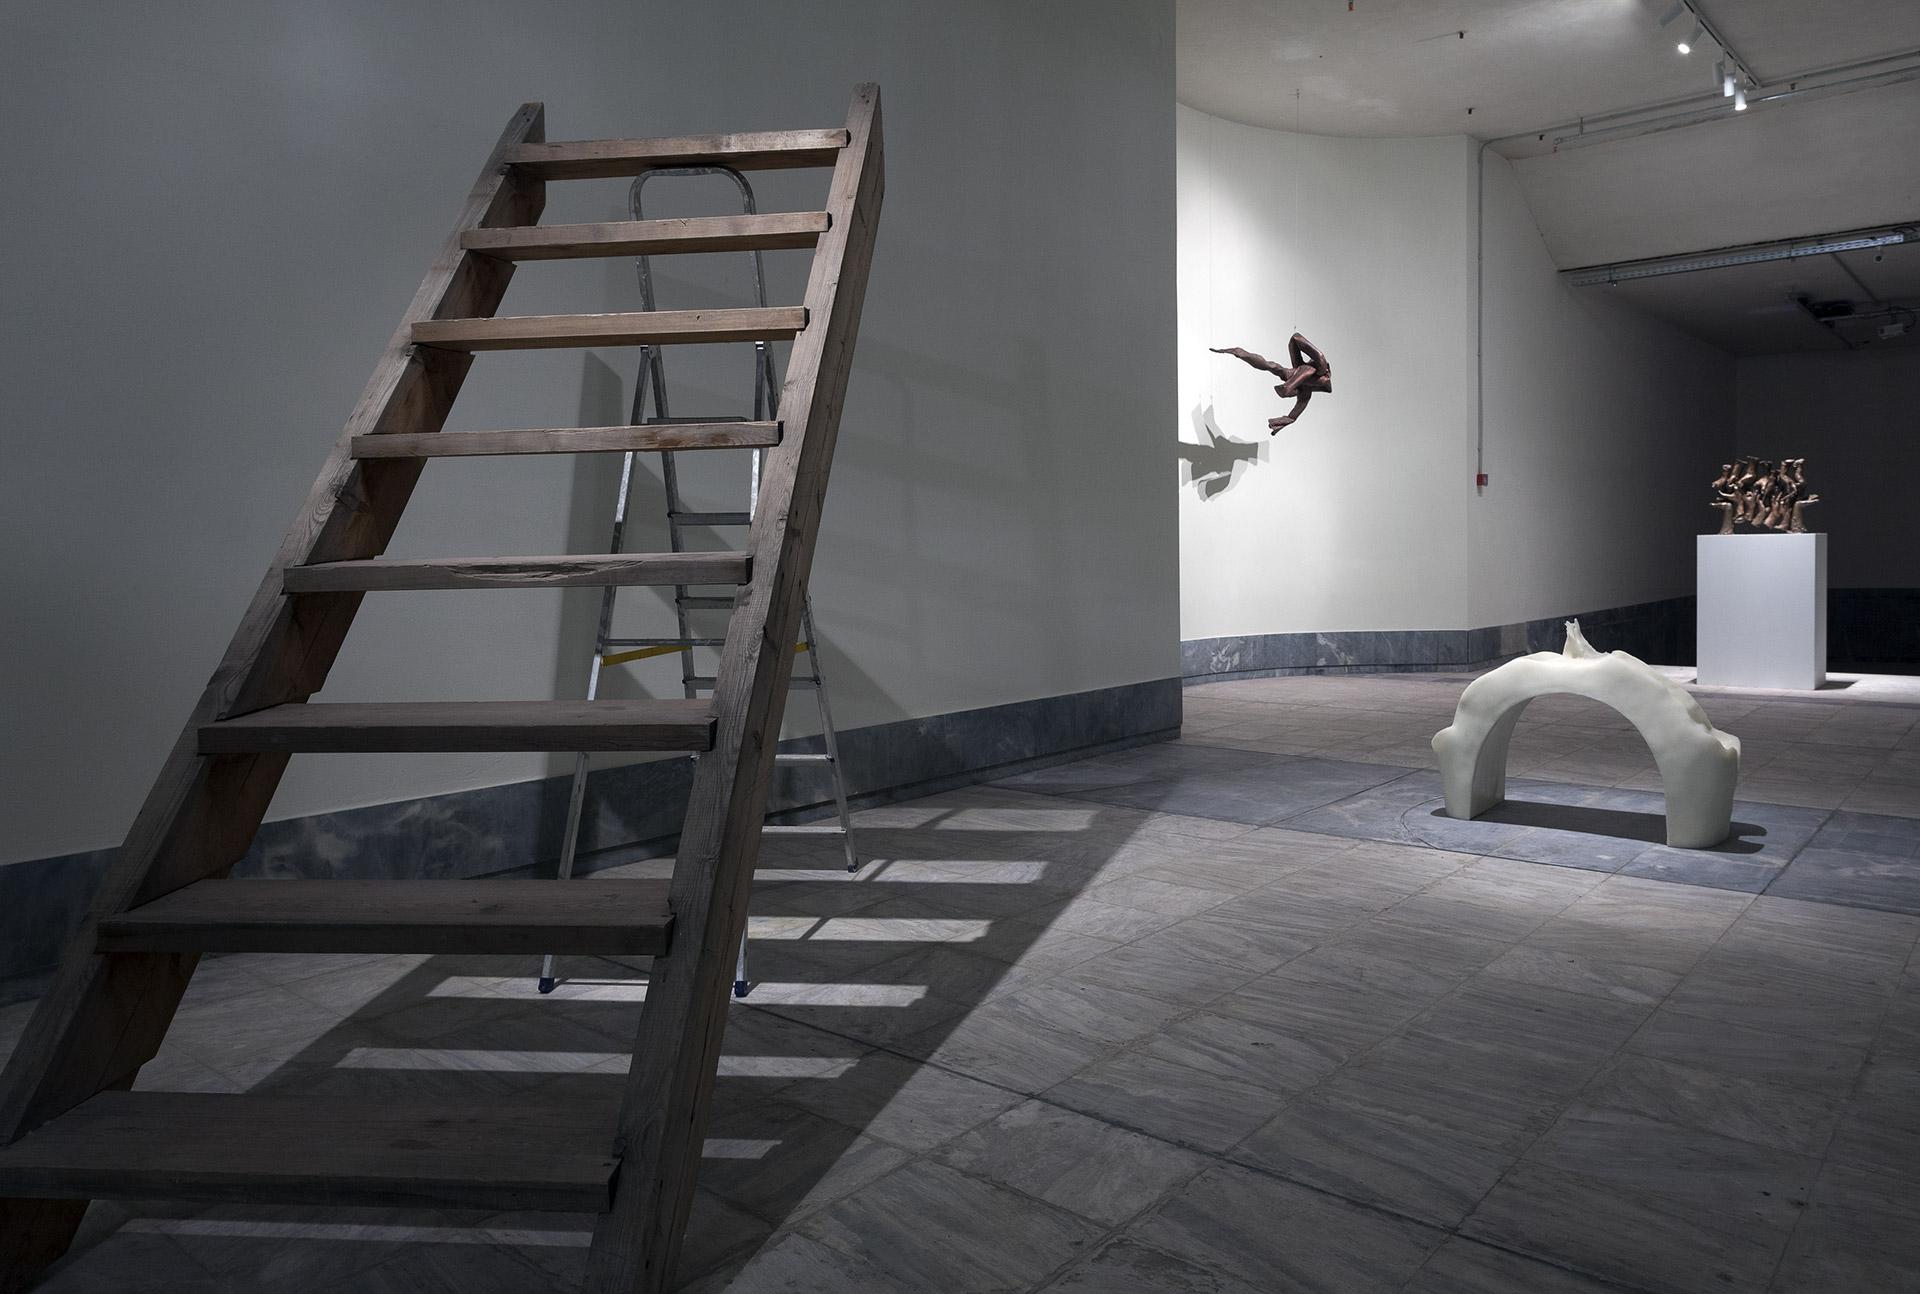 Installation view,ΣάββαςΧριστοδουλίδης,Ladders Joined Together, 2012,Asta Gröting,Space between two people having sex, 2008,Lynda Benglis,Tres, 1976,Bruce Nauman,Untitled (Hand Group),1997©Nikos Markou